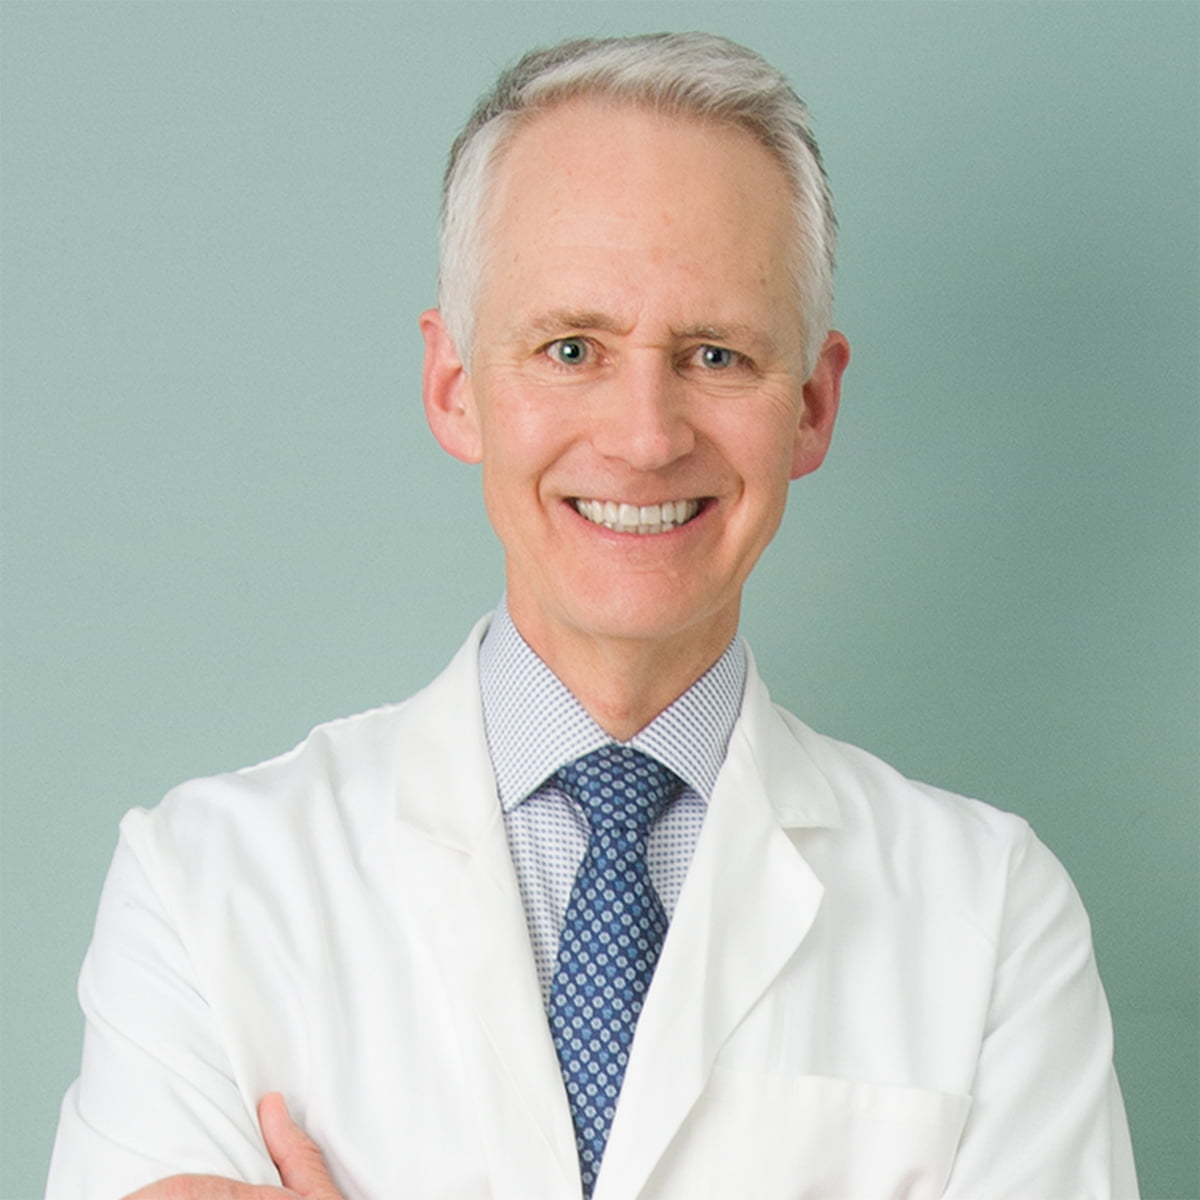 Dr John Hesla